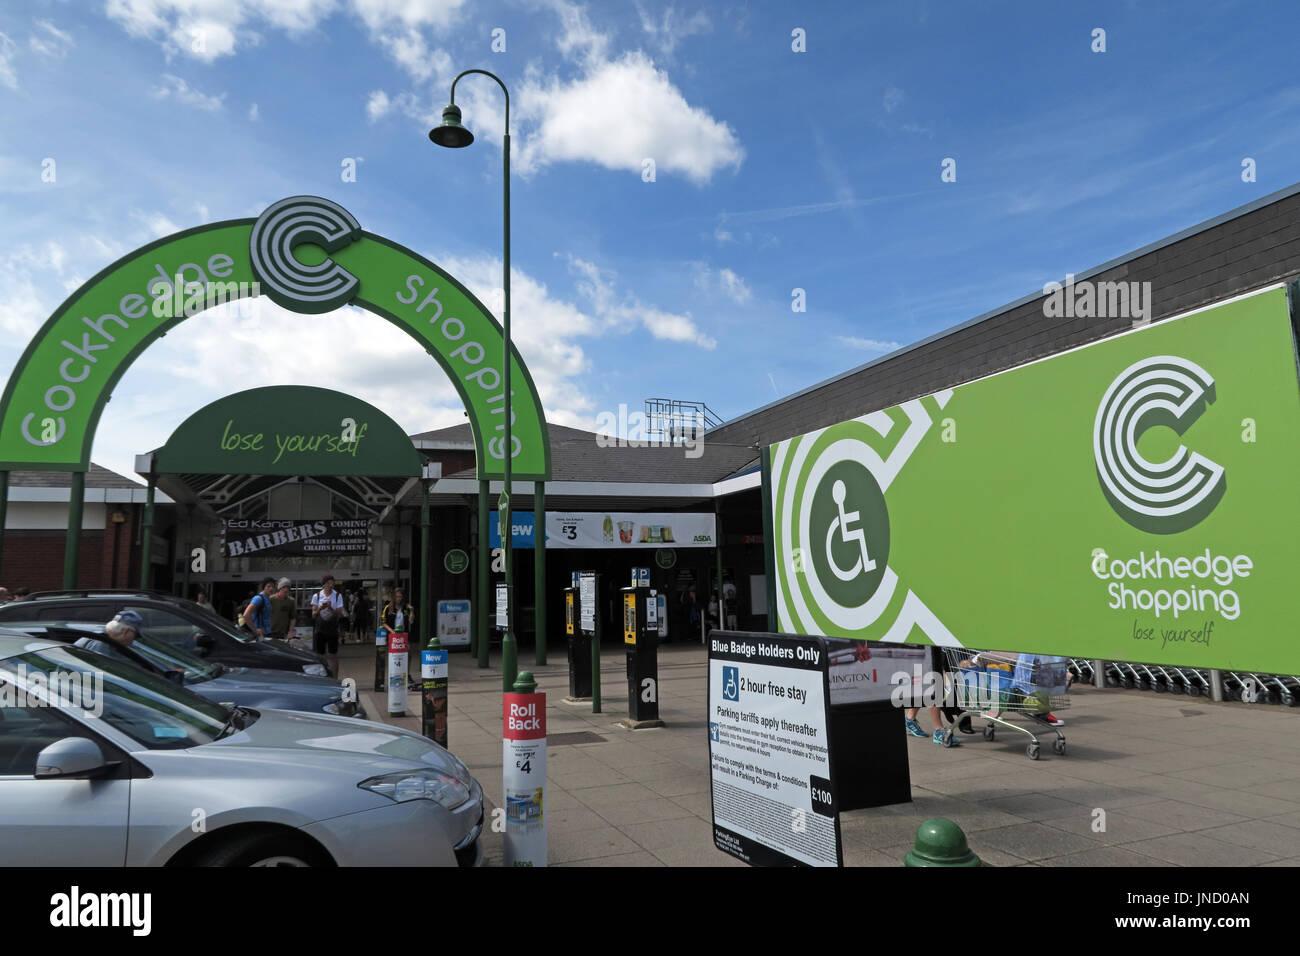 Warrington,shops,WBC,gotonysmith,park,parking